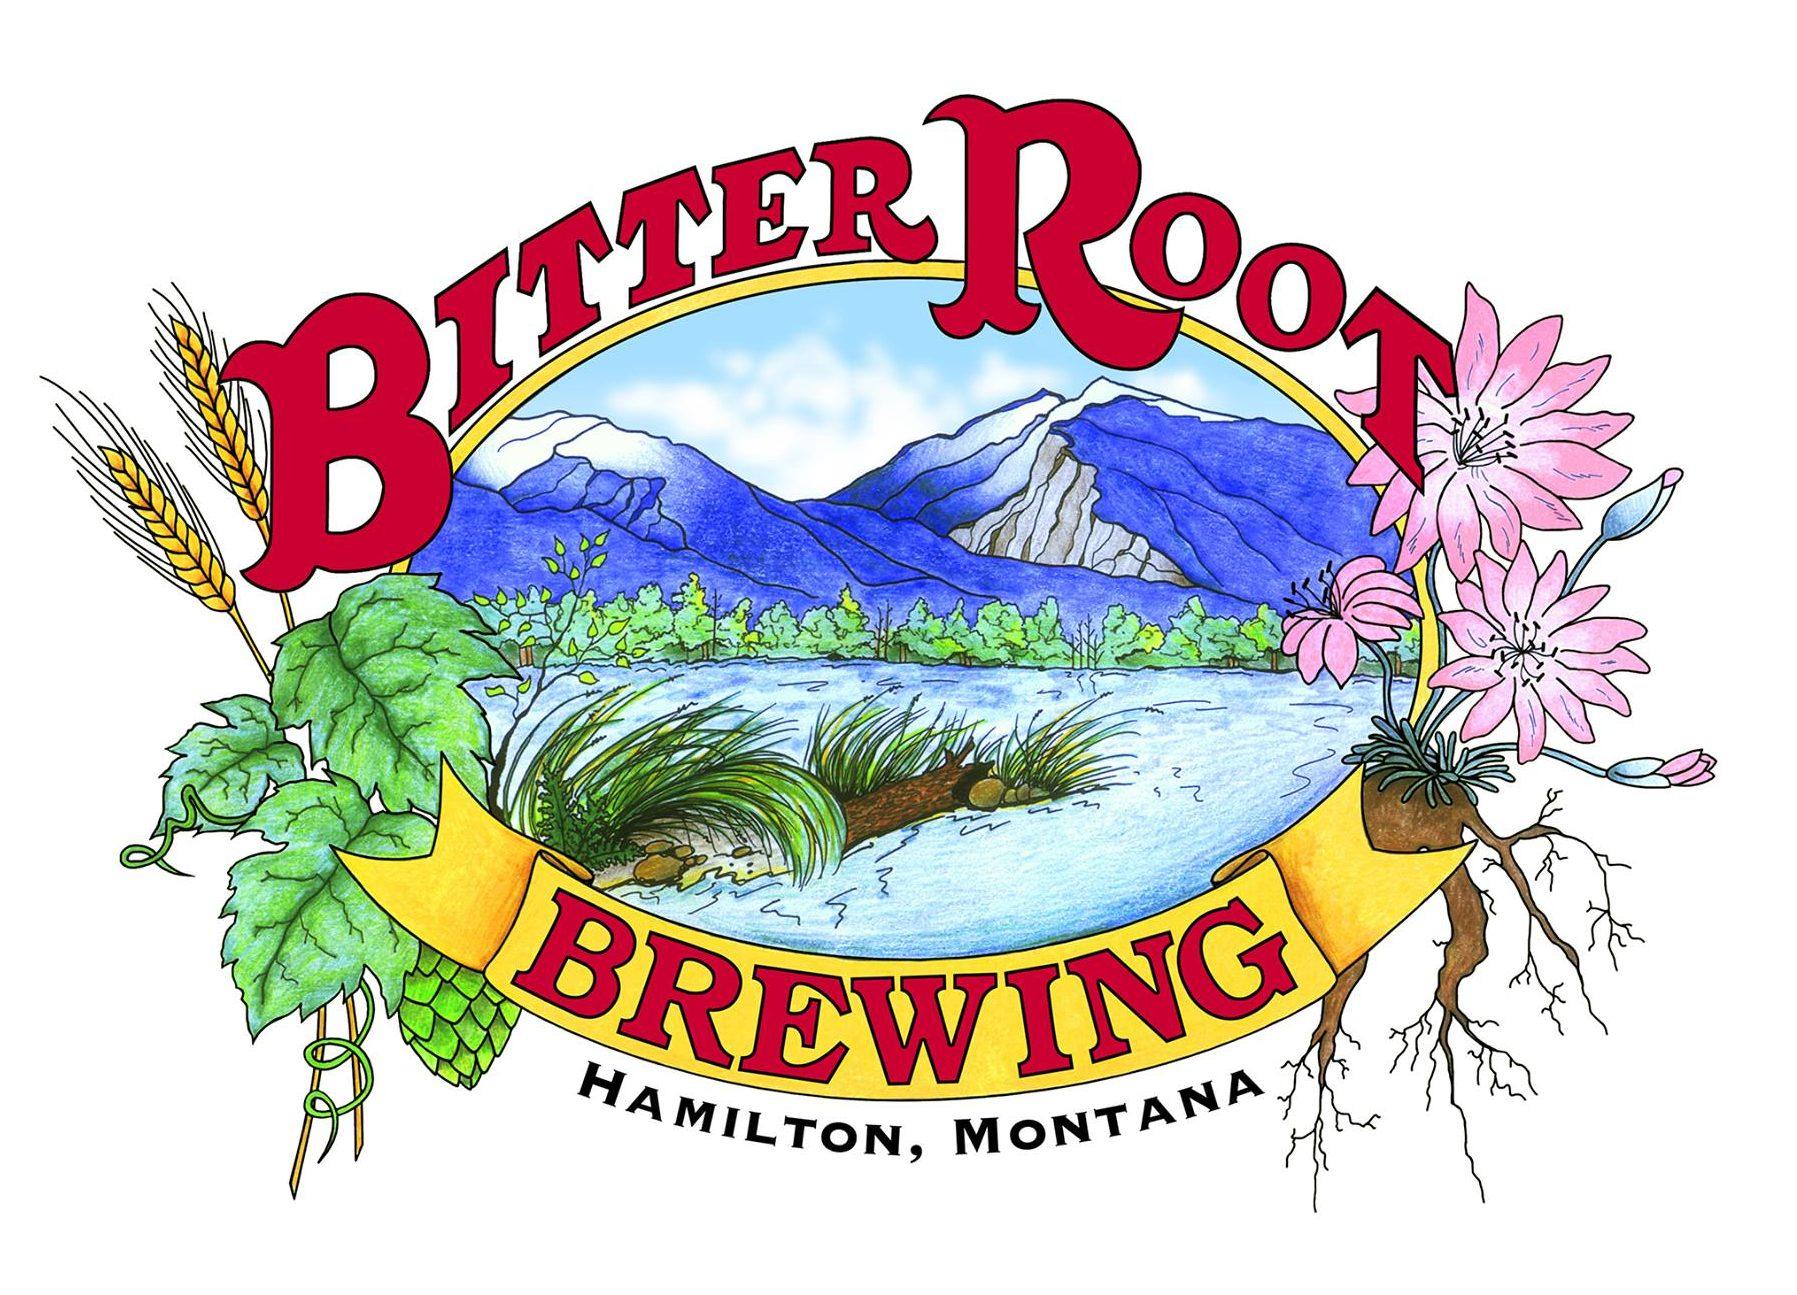 bitter-root-brewing-hamilton-montana